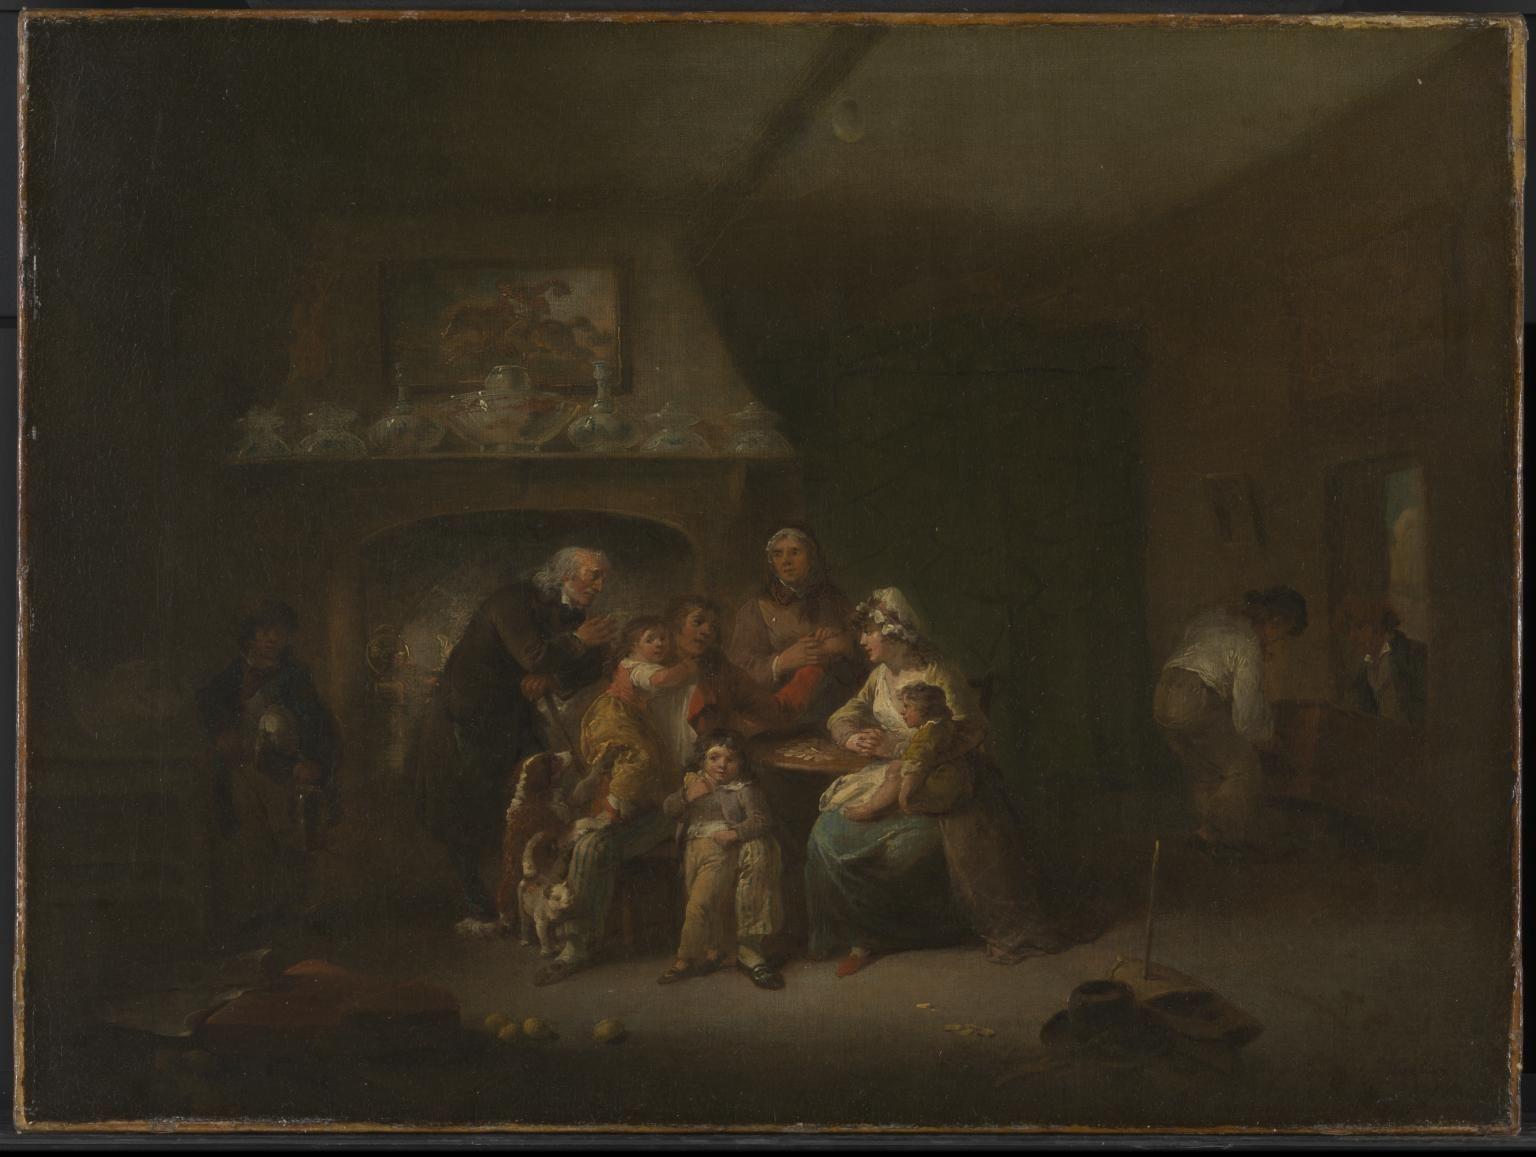 Julius Caesar Ibbetson 'A Married Sailor's Return', c.1800